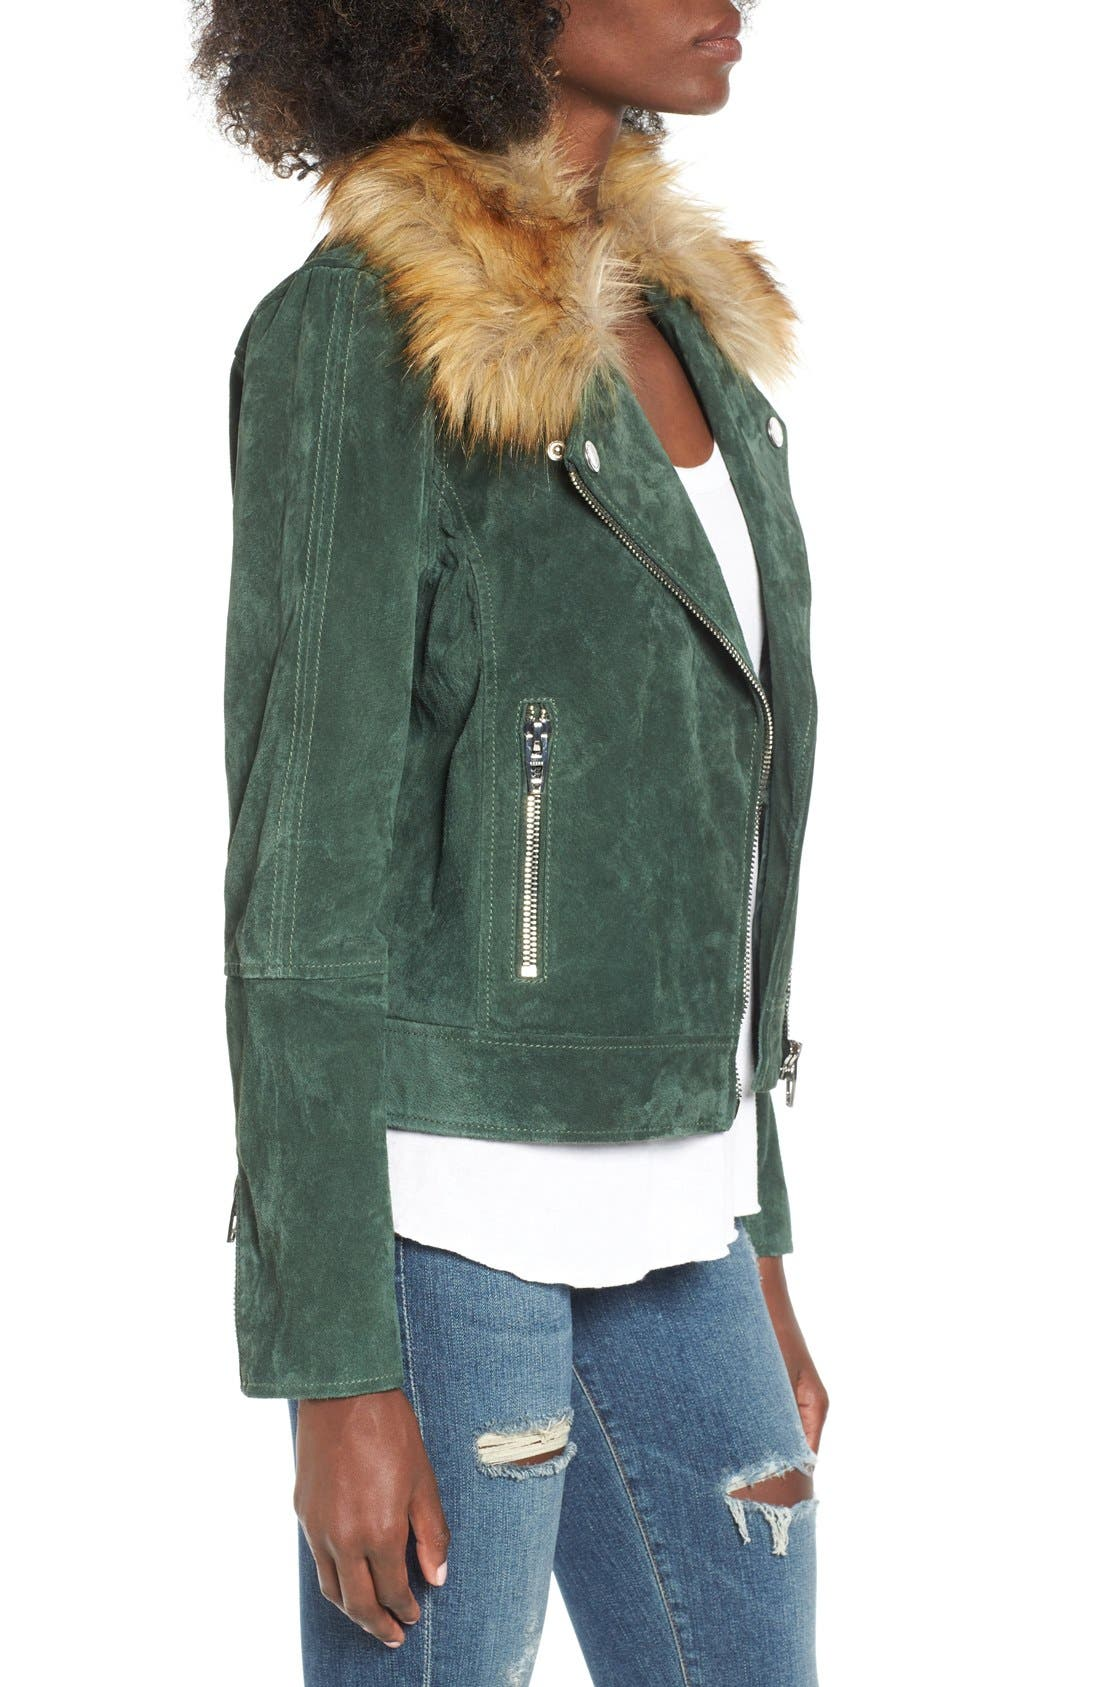 Suede Moto Jacket with Detachable Faux Fur Collar,                             Alternate thumbnail 3, color,                             316